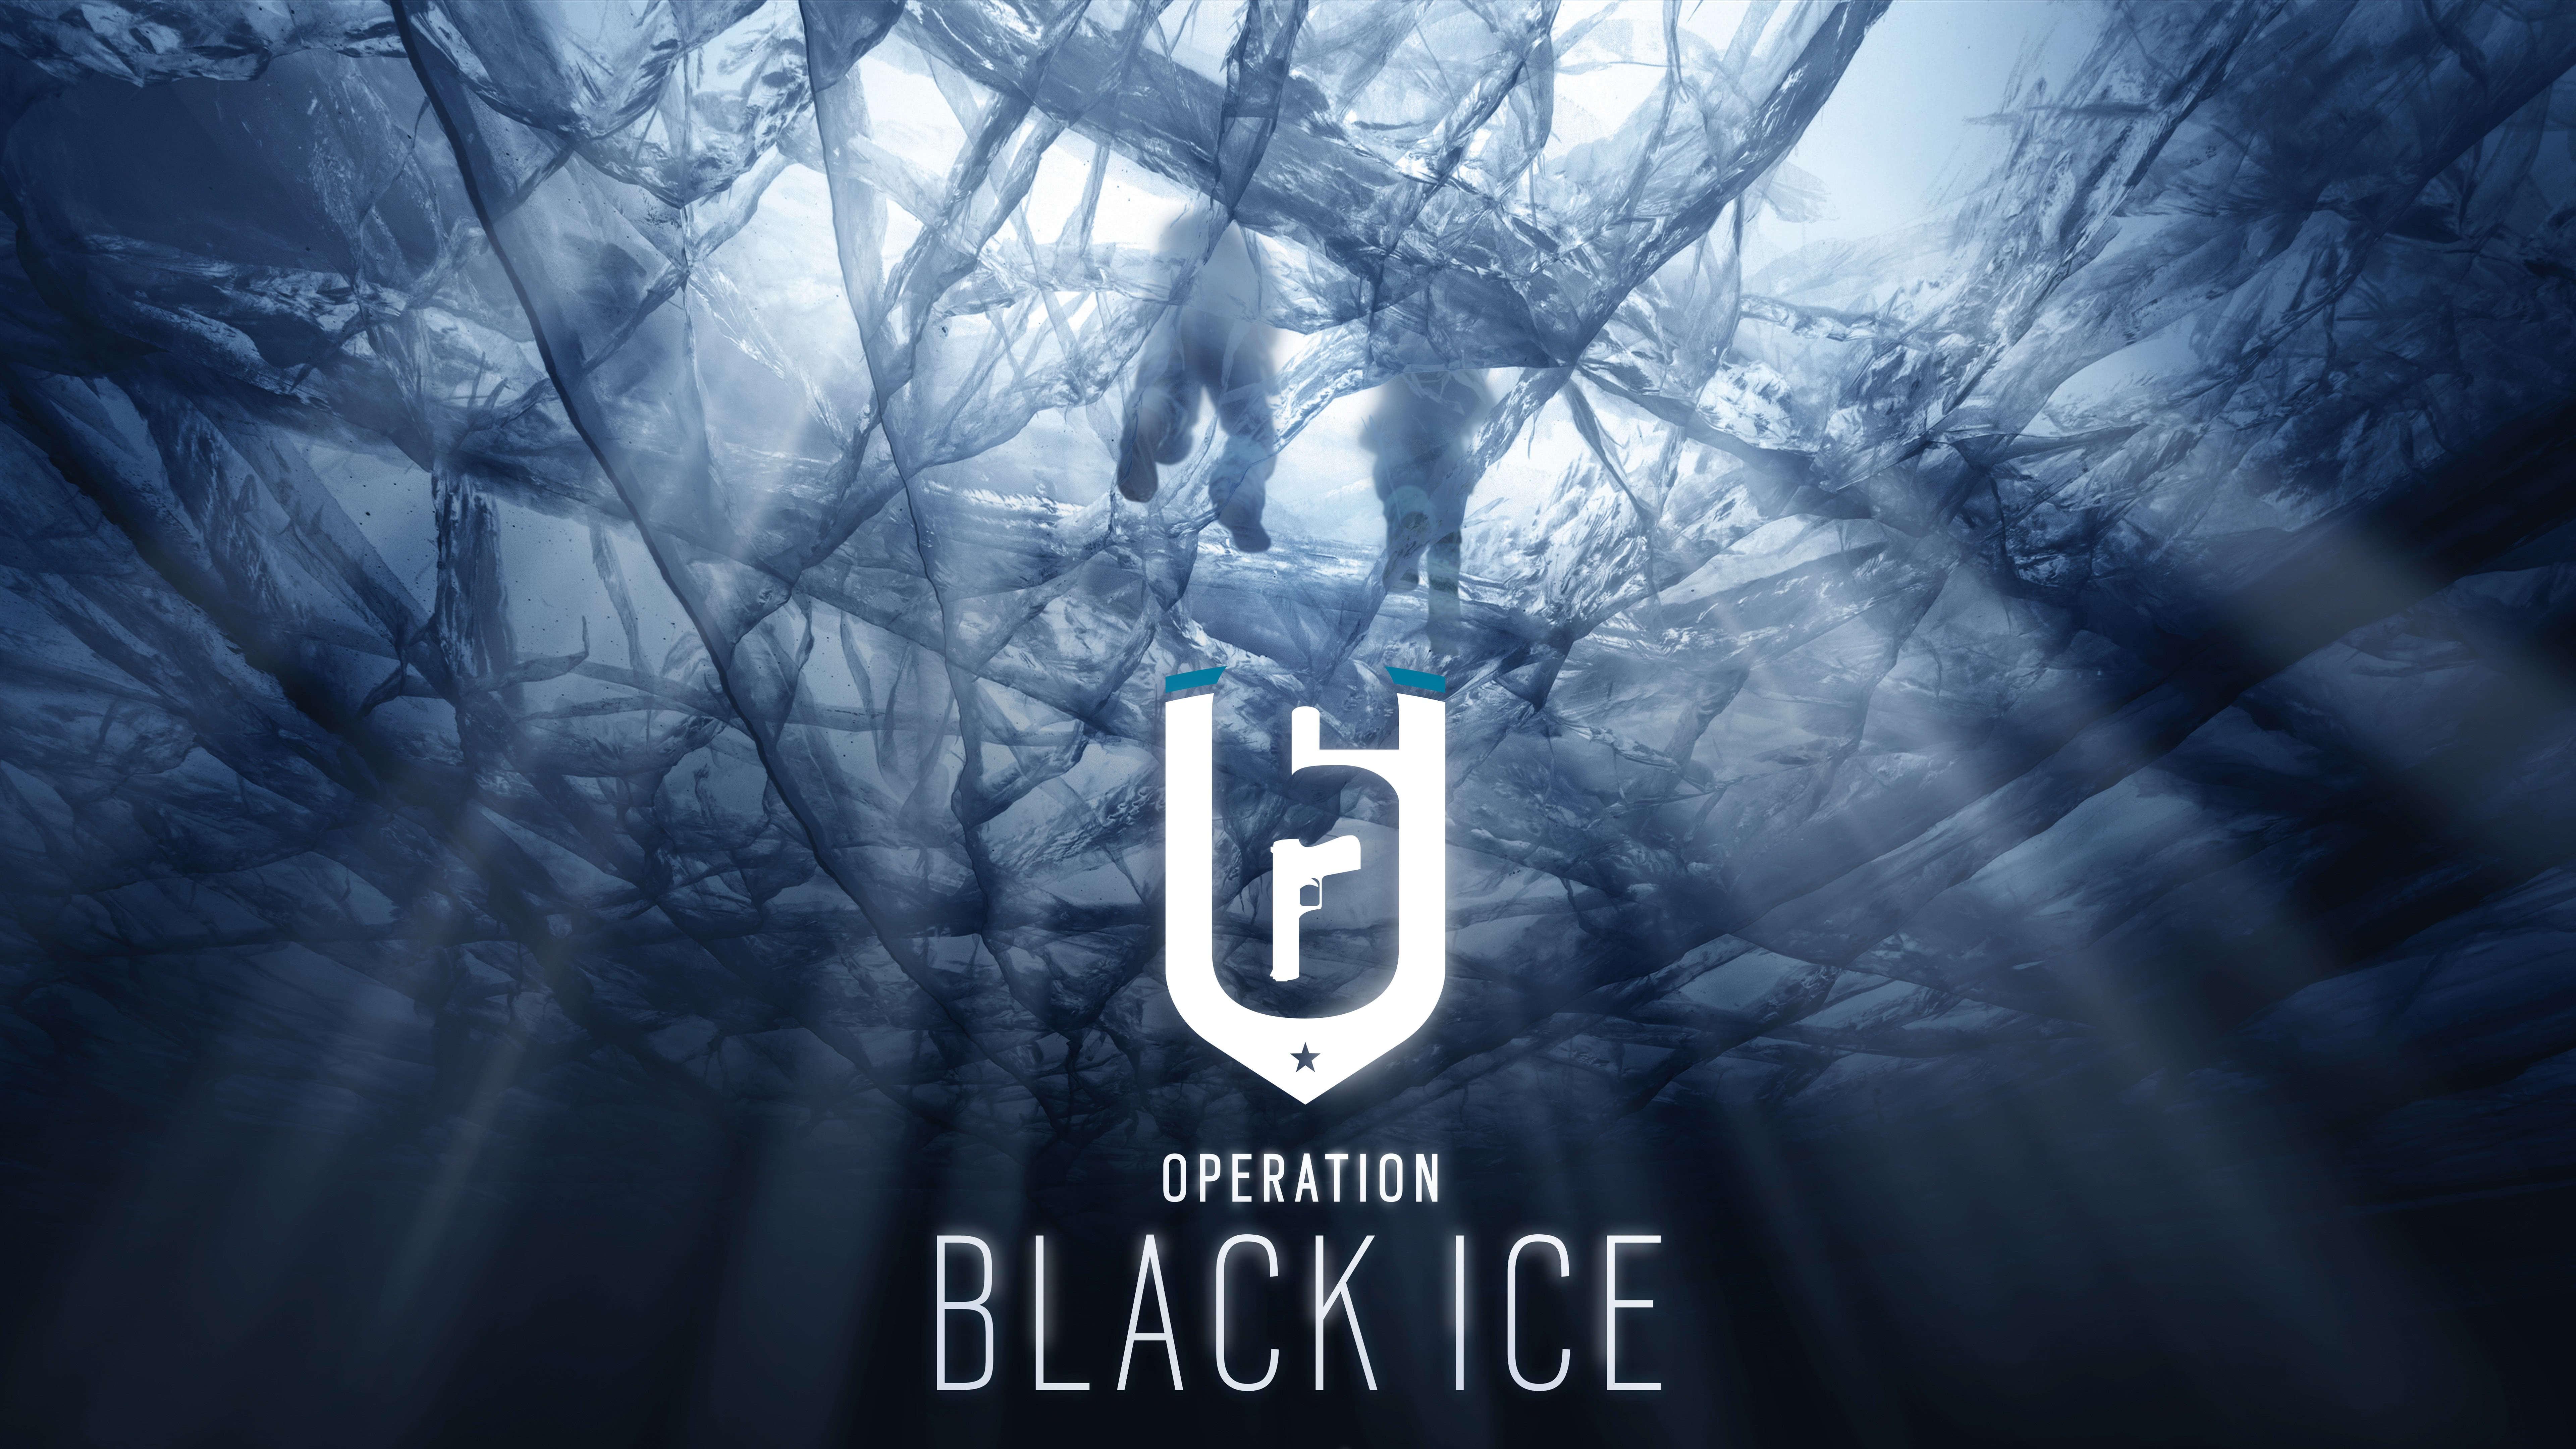 Rainbow Six Siege Operation Black Ice UHD 8K Wallpaper Pixelz 7680x4320